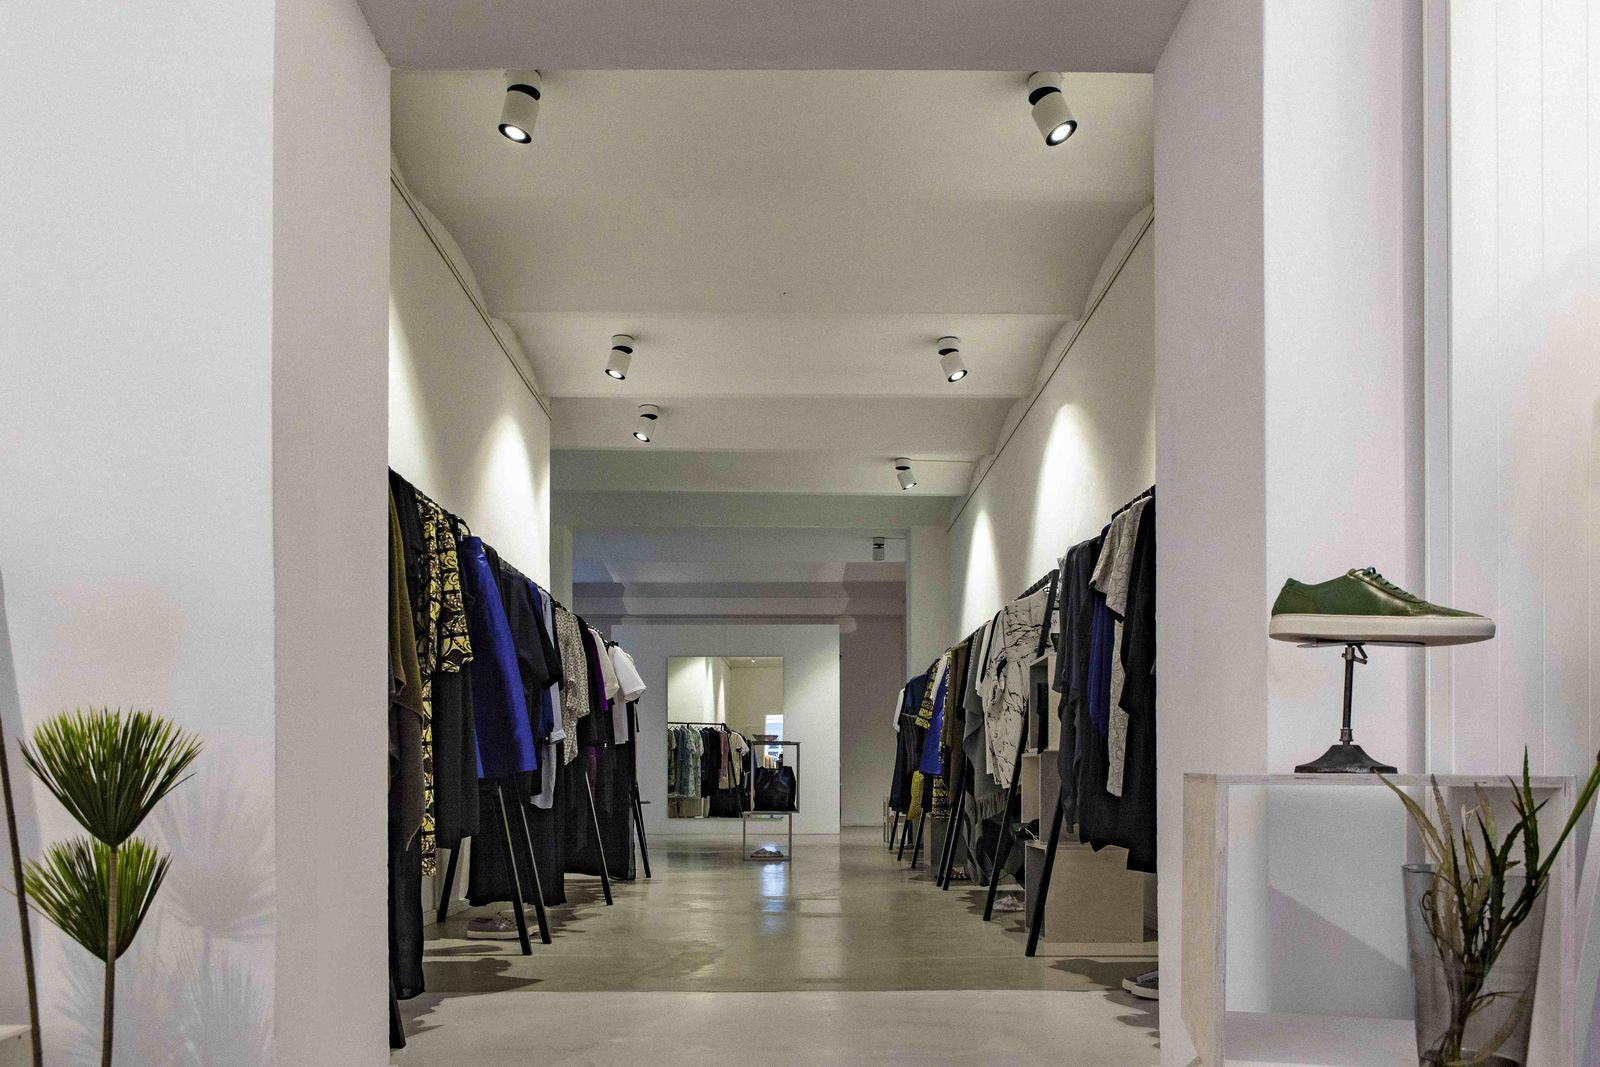 Les Soeurs Shop - The Curvy Concept Store in Berlin (Bild 2)